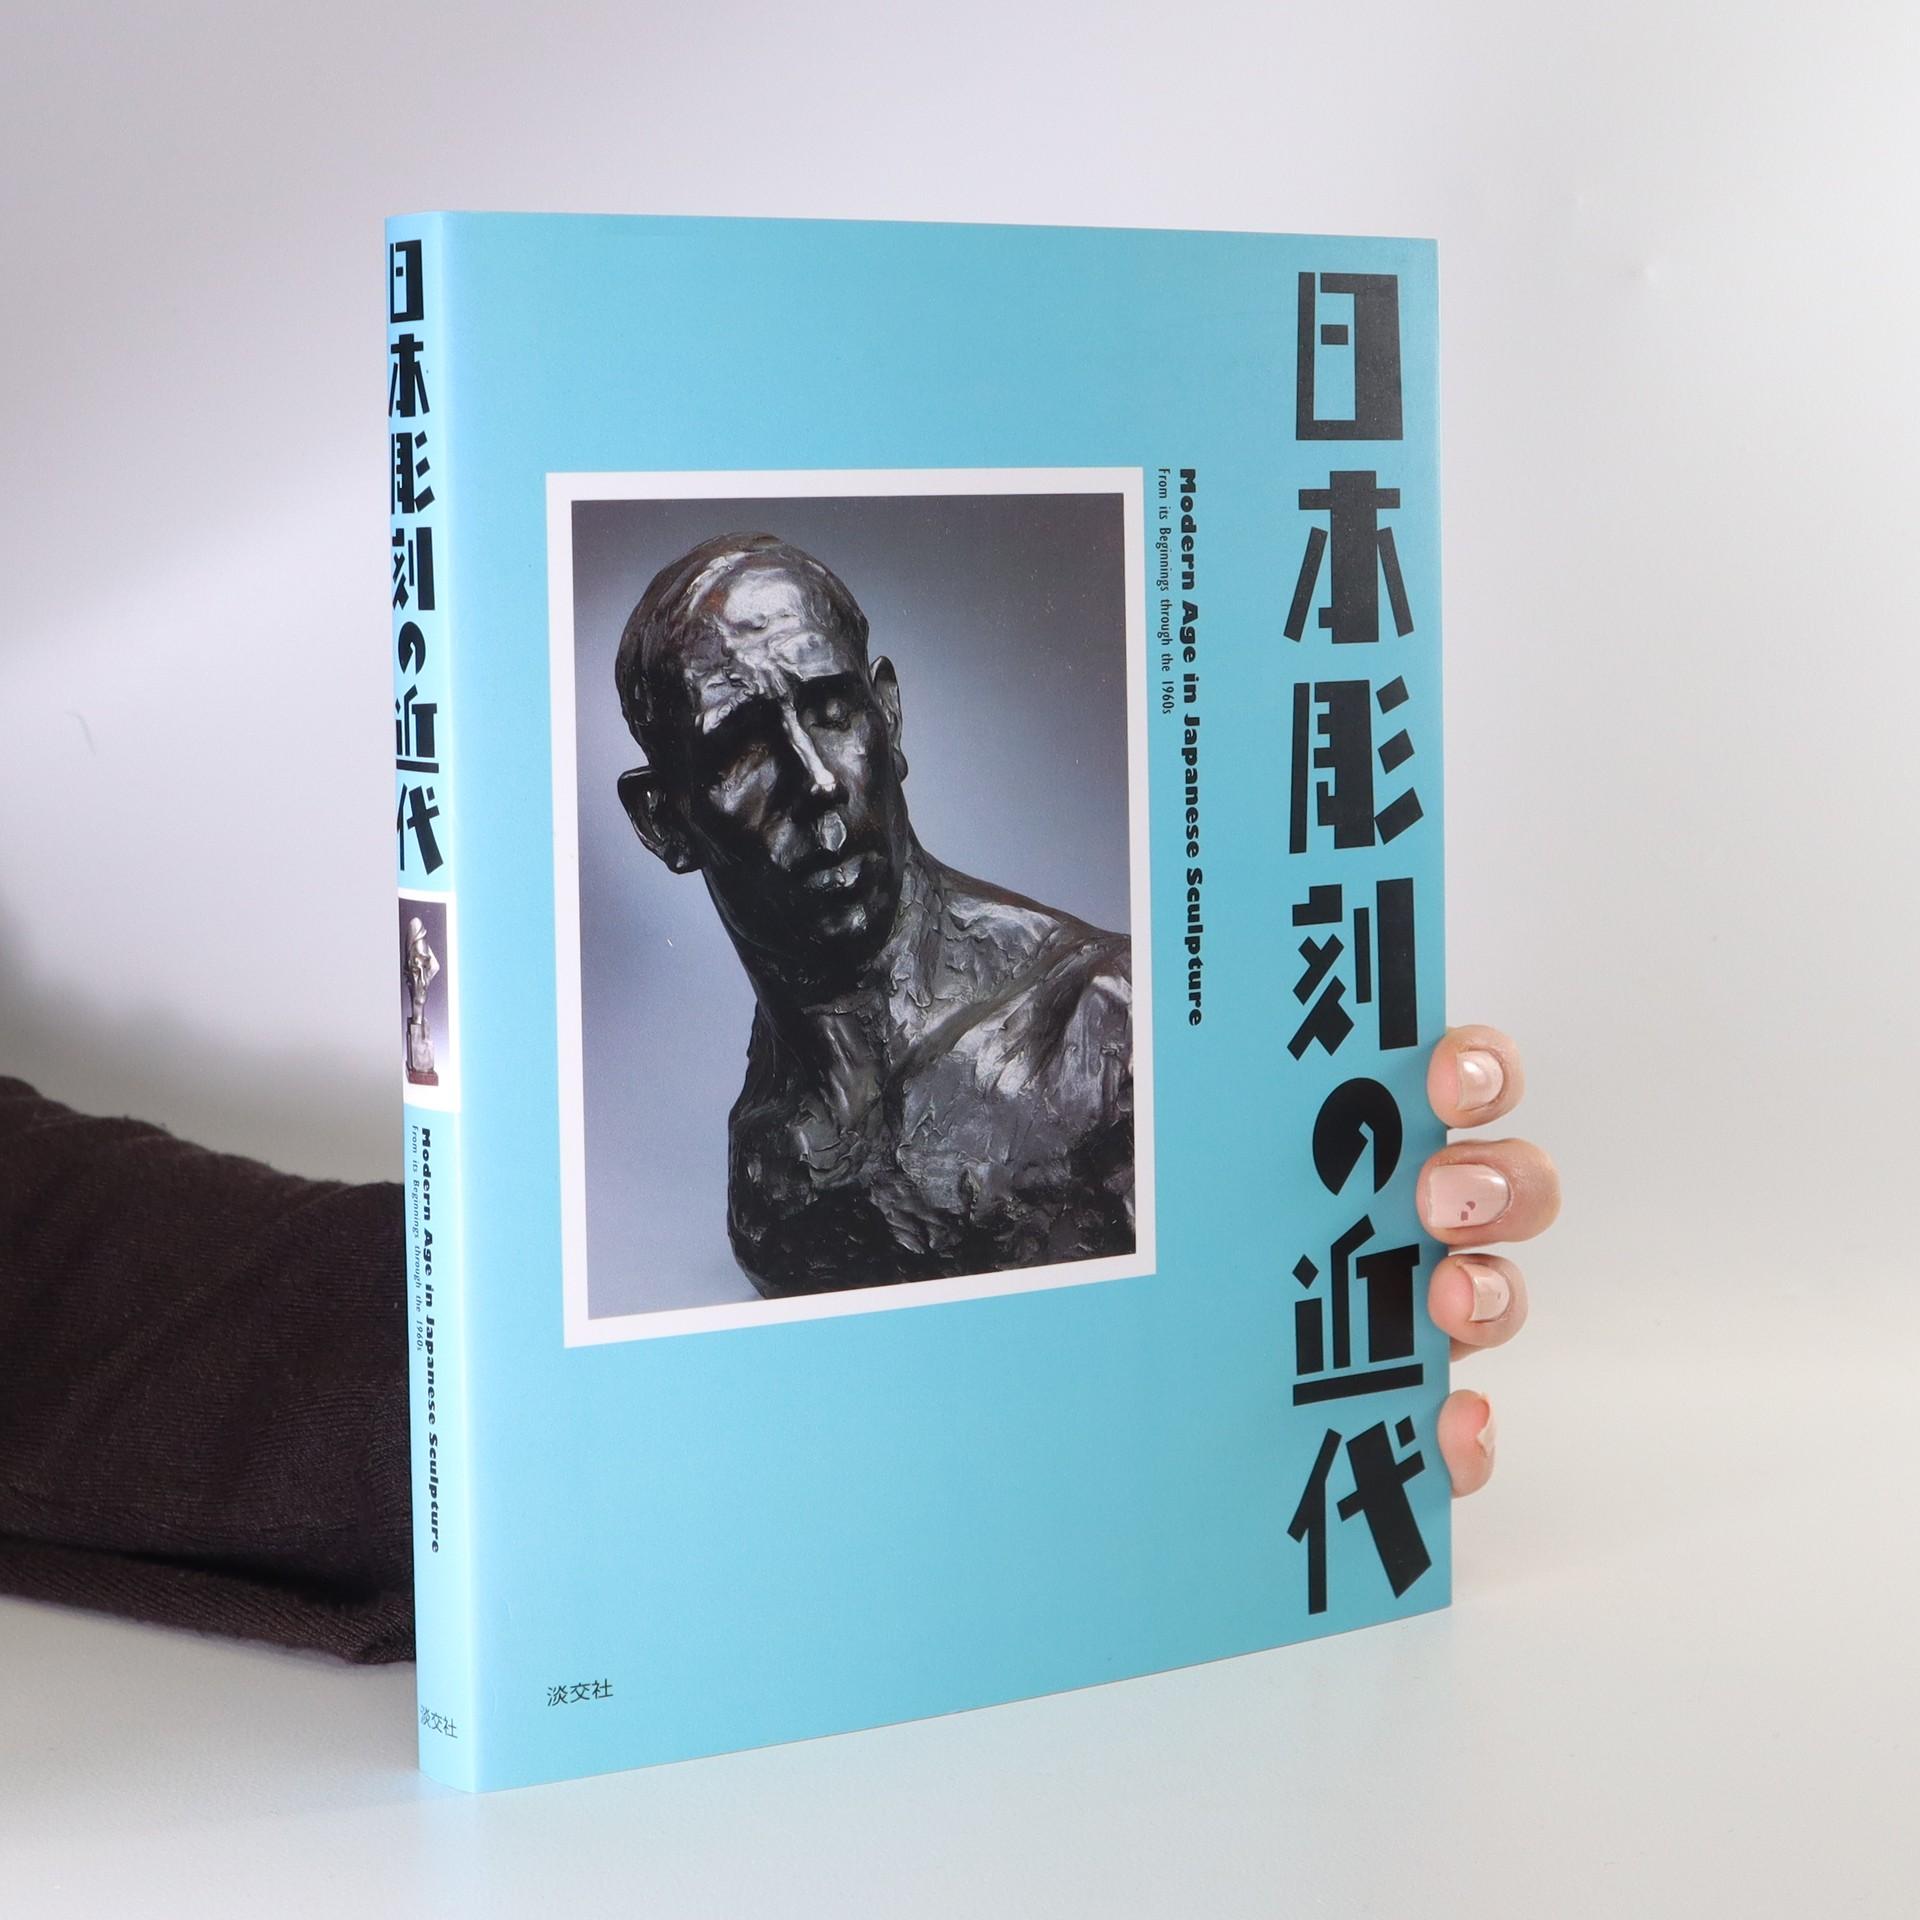 antikvární kniha Nihon chokoku no kindai = Modern age in Japanese sculpture : from its beginnings through the 1960s, 2007